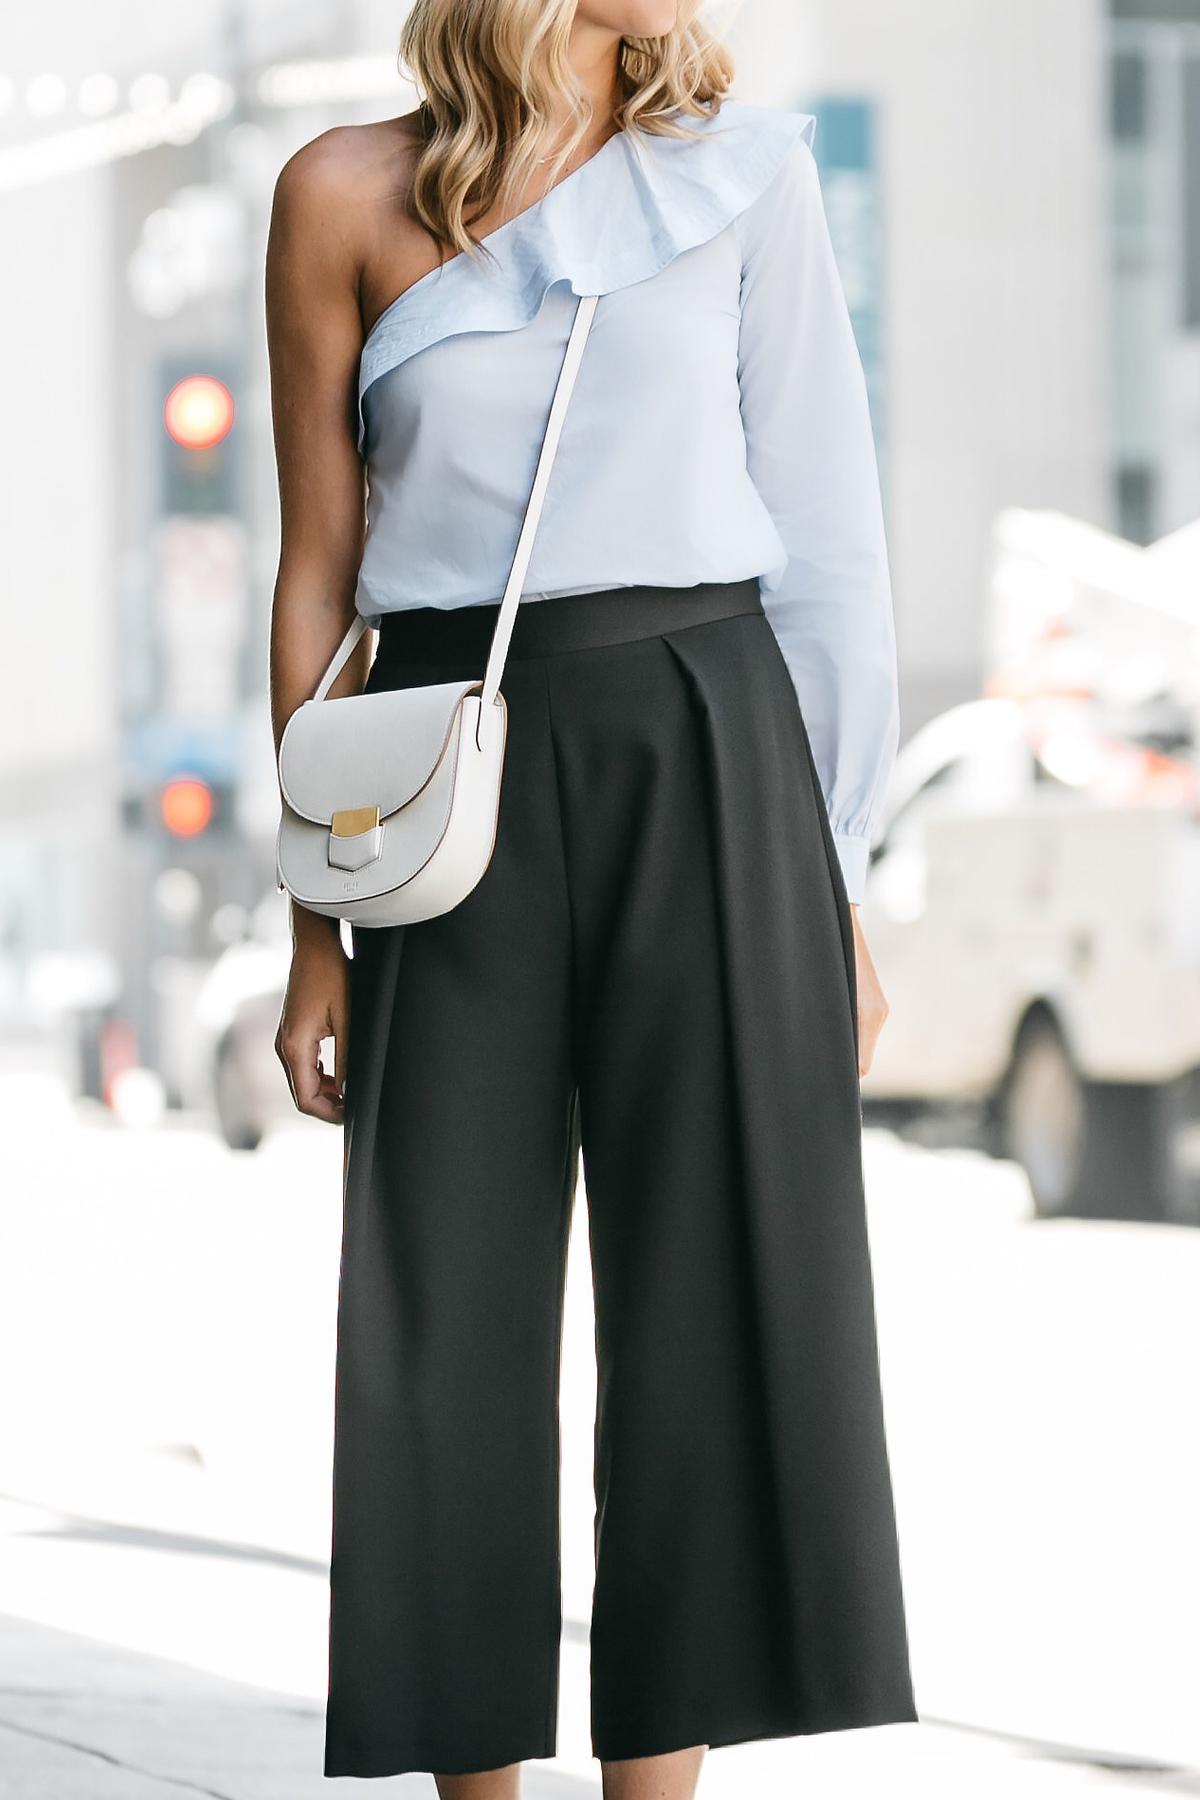 Fashion Jackson, Dallas Blogger, Fashion Blogger, Street Style, A.L.C One Shoulder Ruffle Top, Topshop Black Culottes, Steve Madden Carrson Ankle Strap Heeled Sandals, Celine White Trotteur Handbag